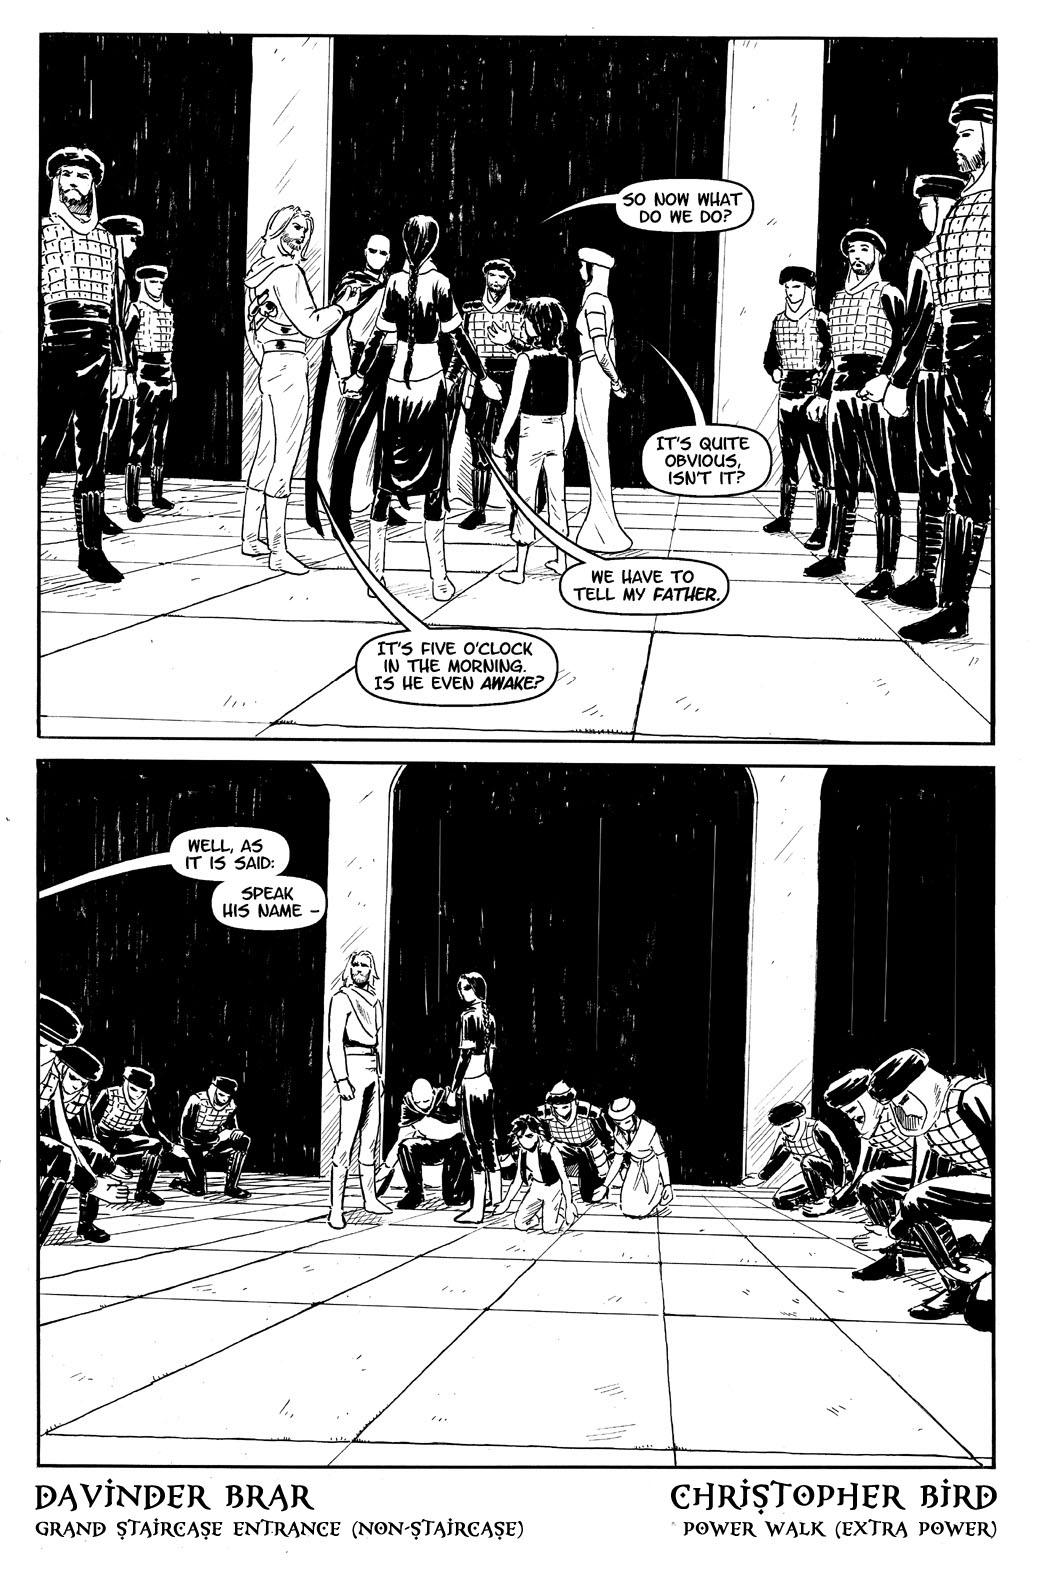 Book Five, Page Twenty-Seven